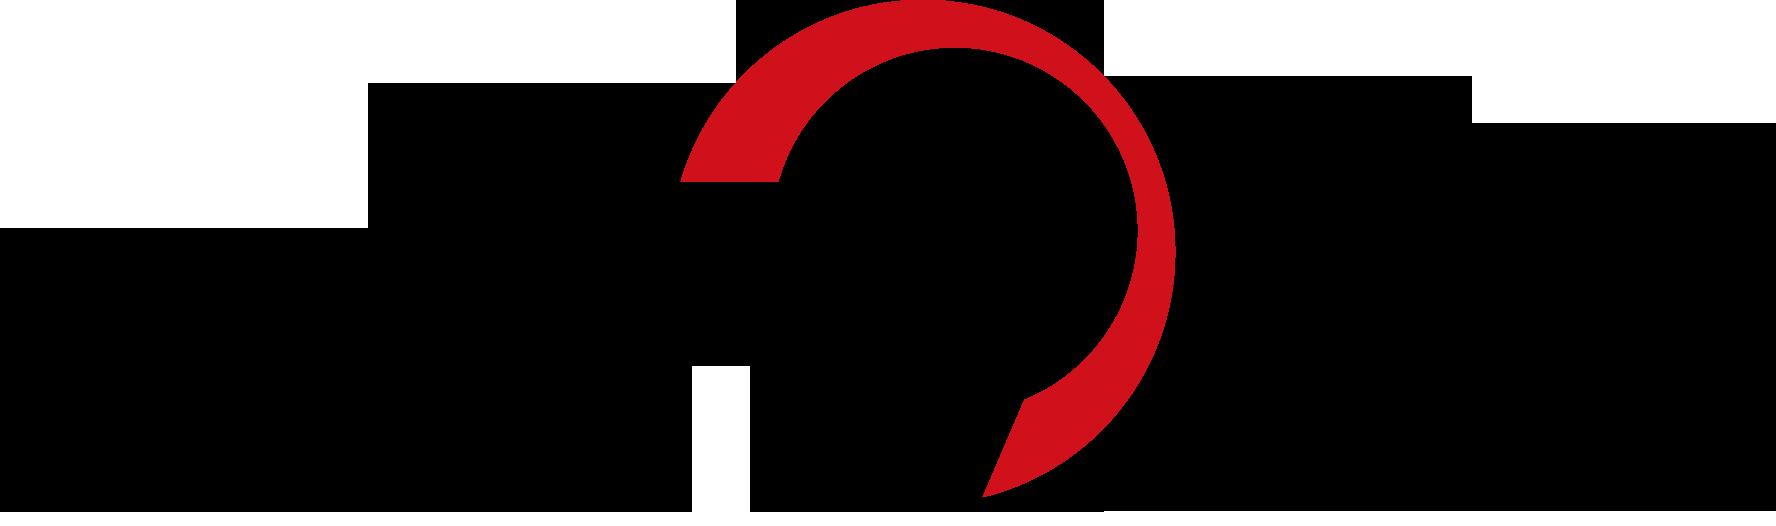 央視網logo-1.png